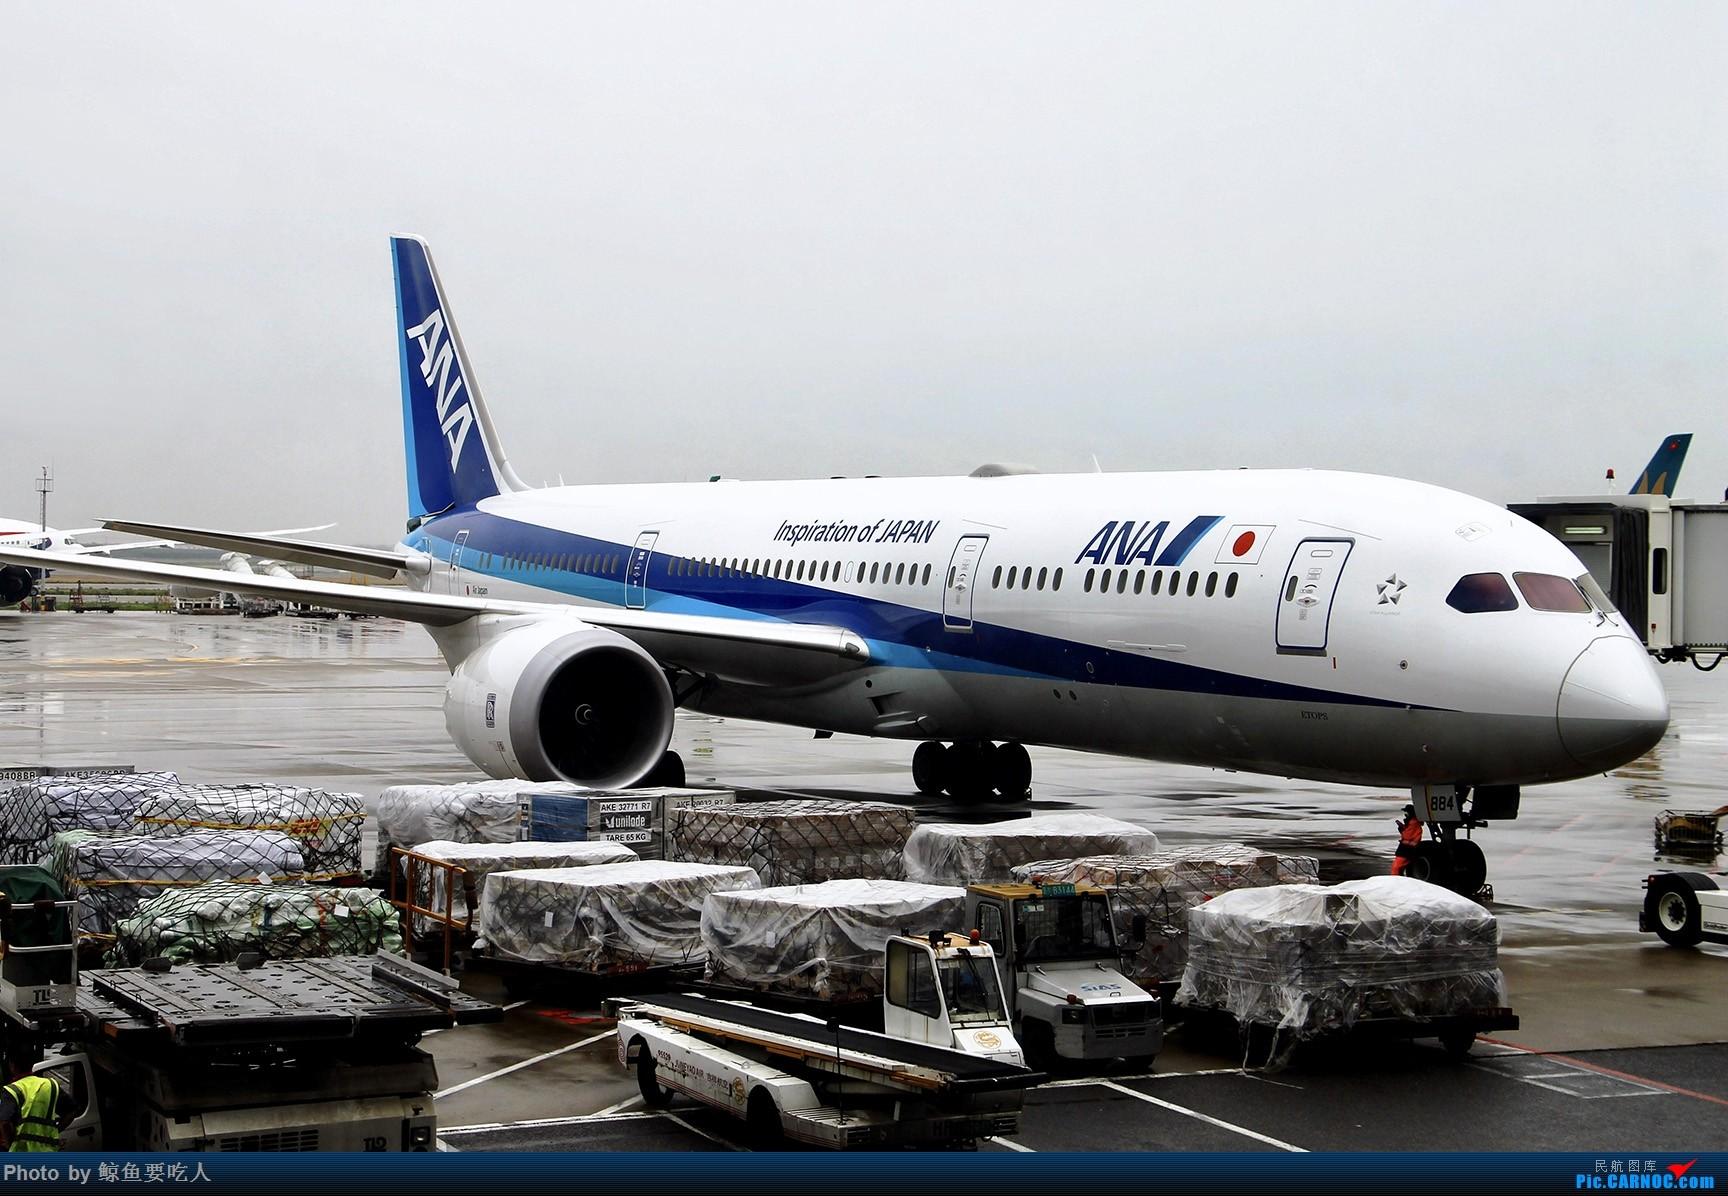 Re:[原创]PVG — KHN — NKG 上海浦东—南昌—南京 走马观花的周末游 在暴雨后的上海浦东 疯狂拍机 BOEING 787-9